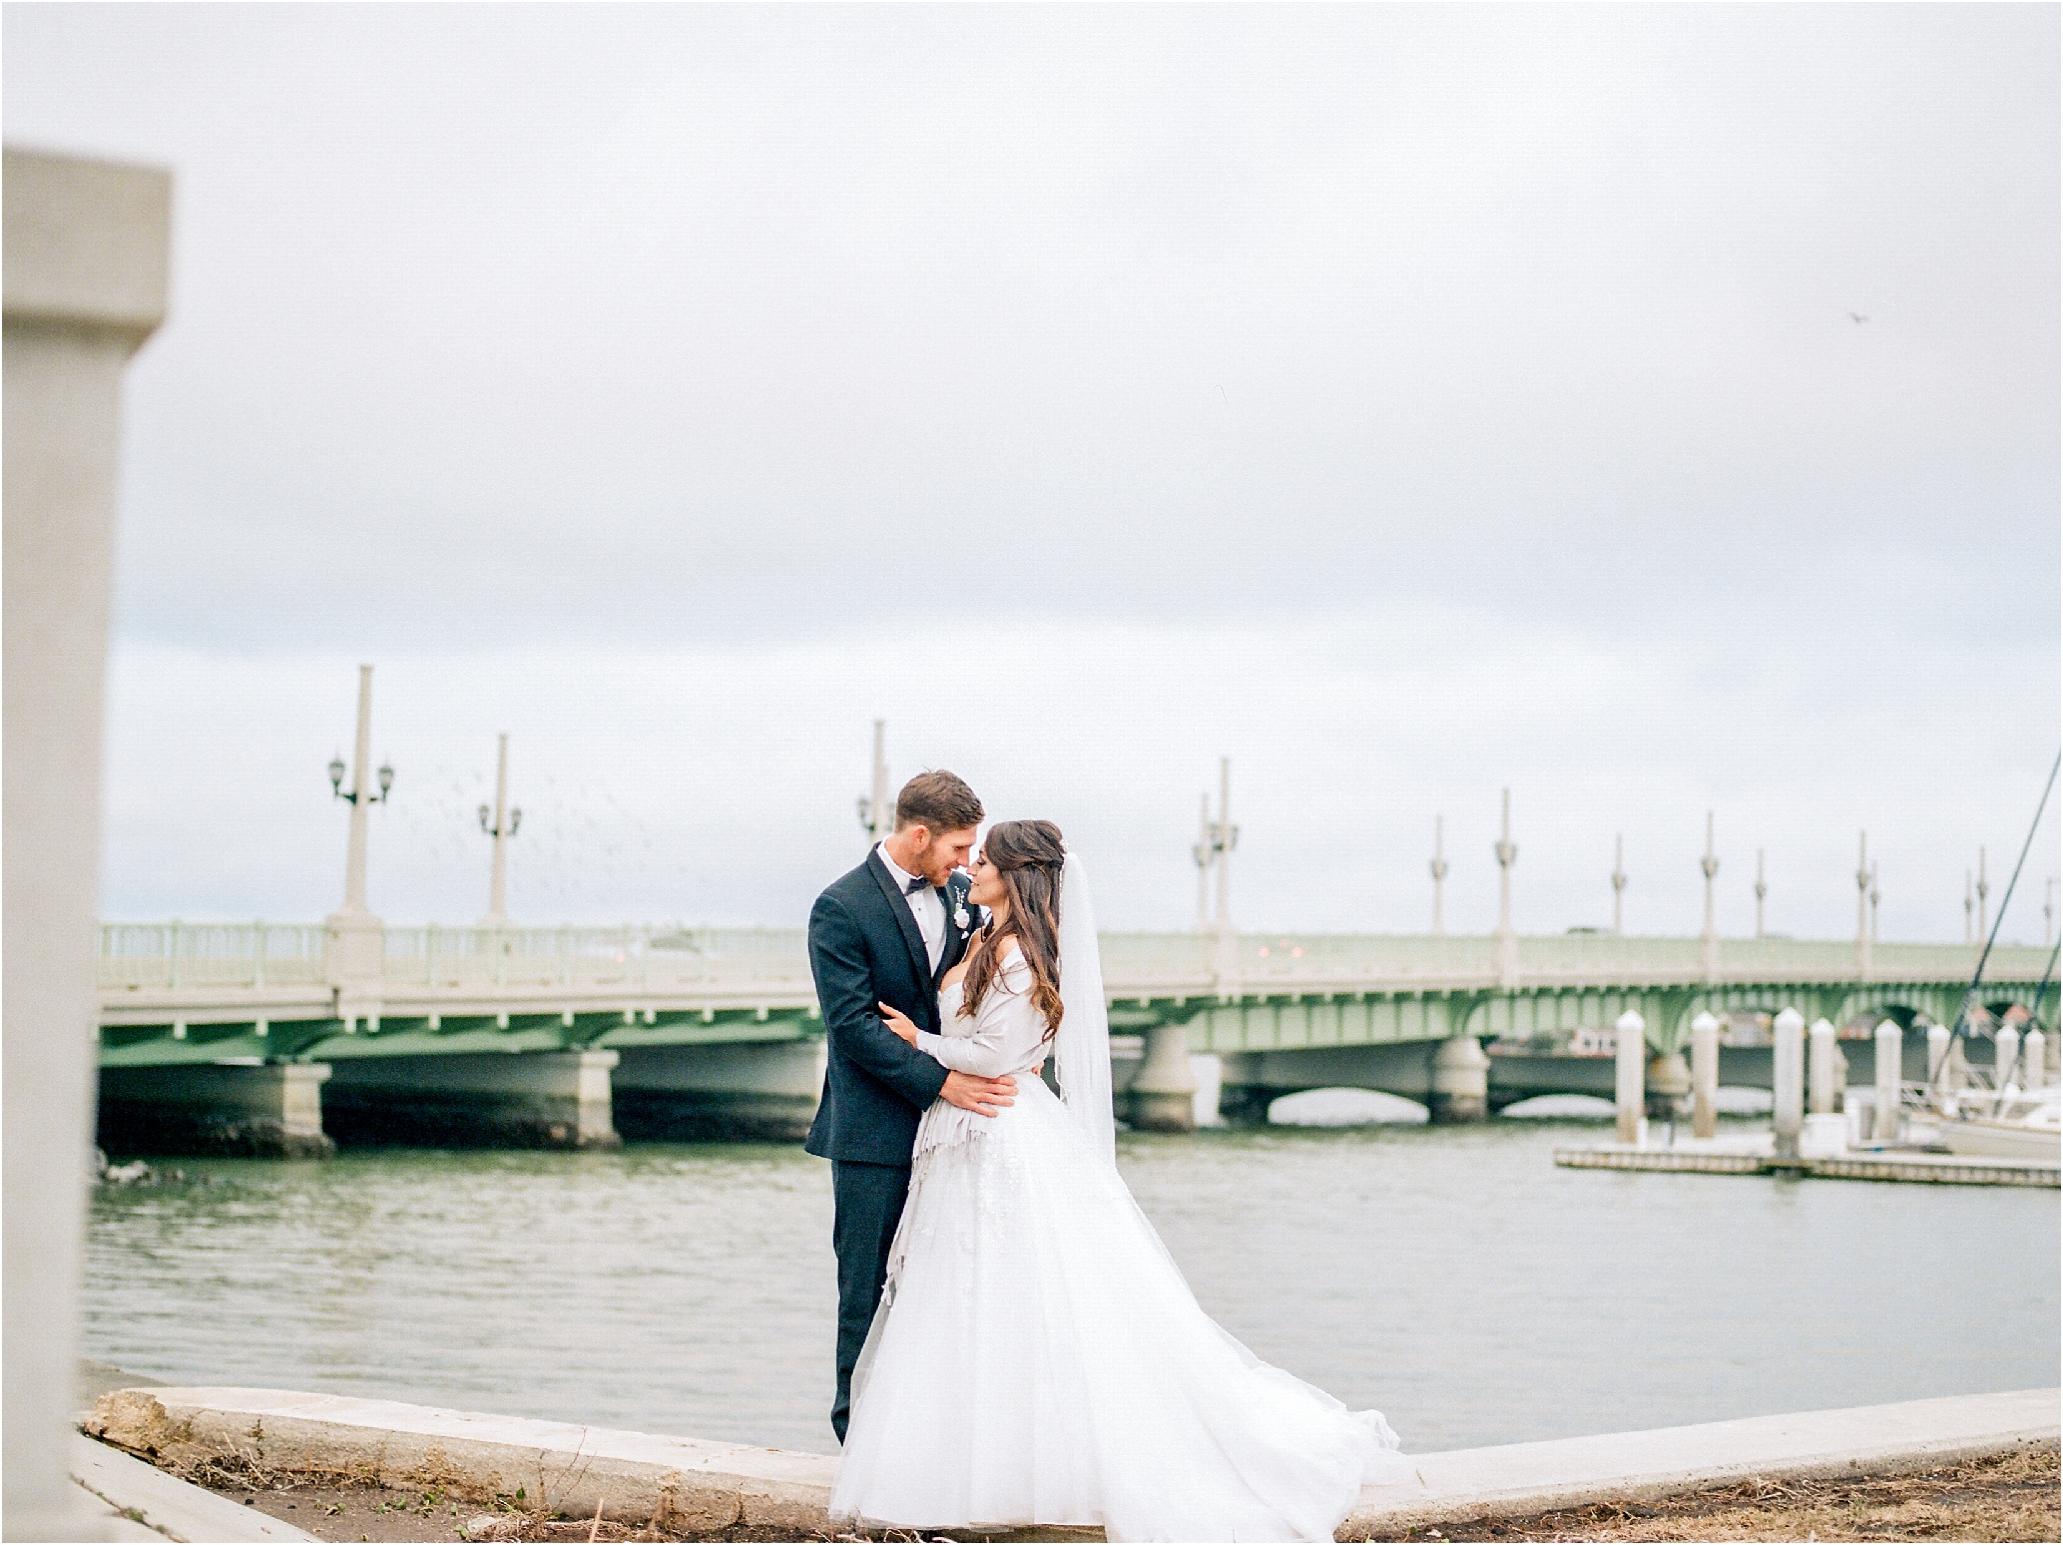 Lisa Silva Photography- Ponte Vedra Beach and Jacksonville, Florida Fine Art Film Wedding Photography- Wedding at The White Room Villa Blanca in St. Augustine, Florida_0058.jpg